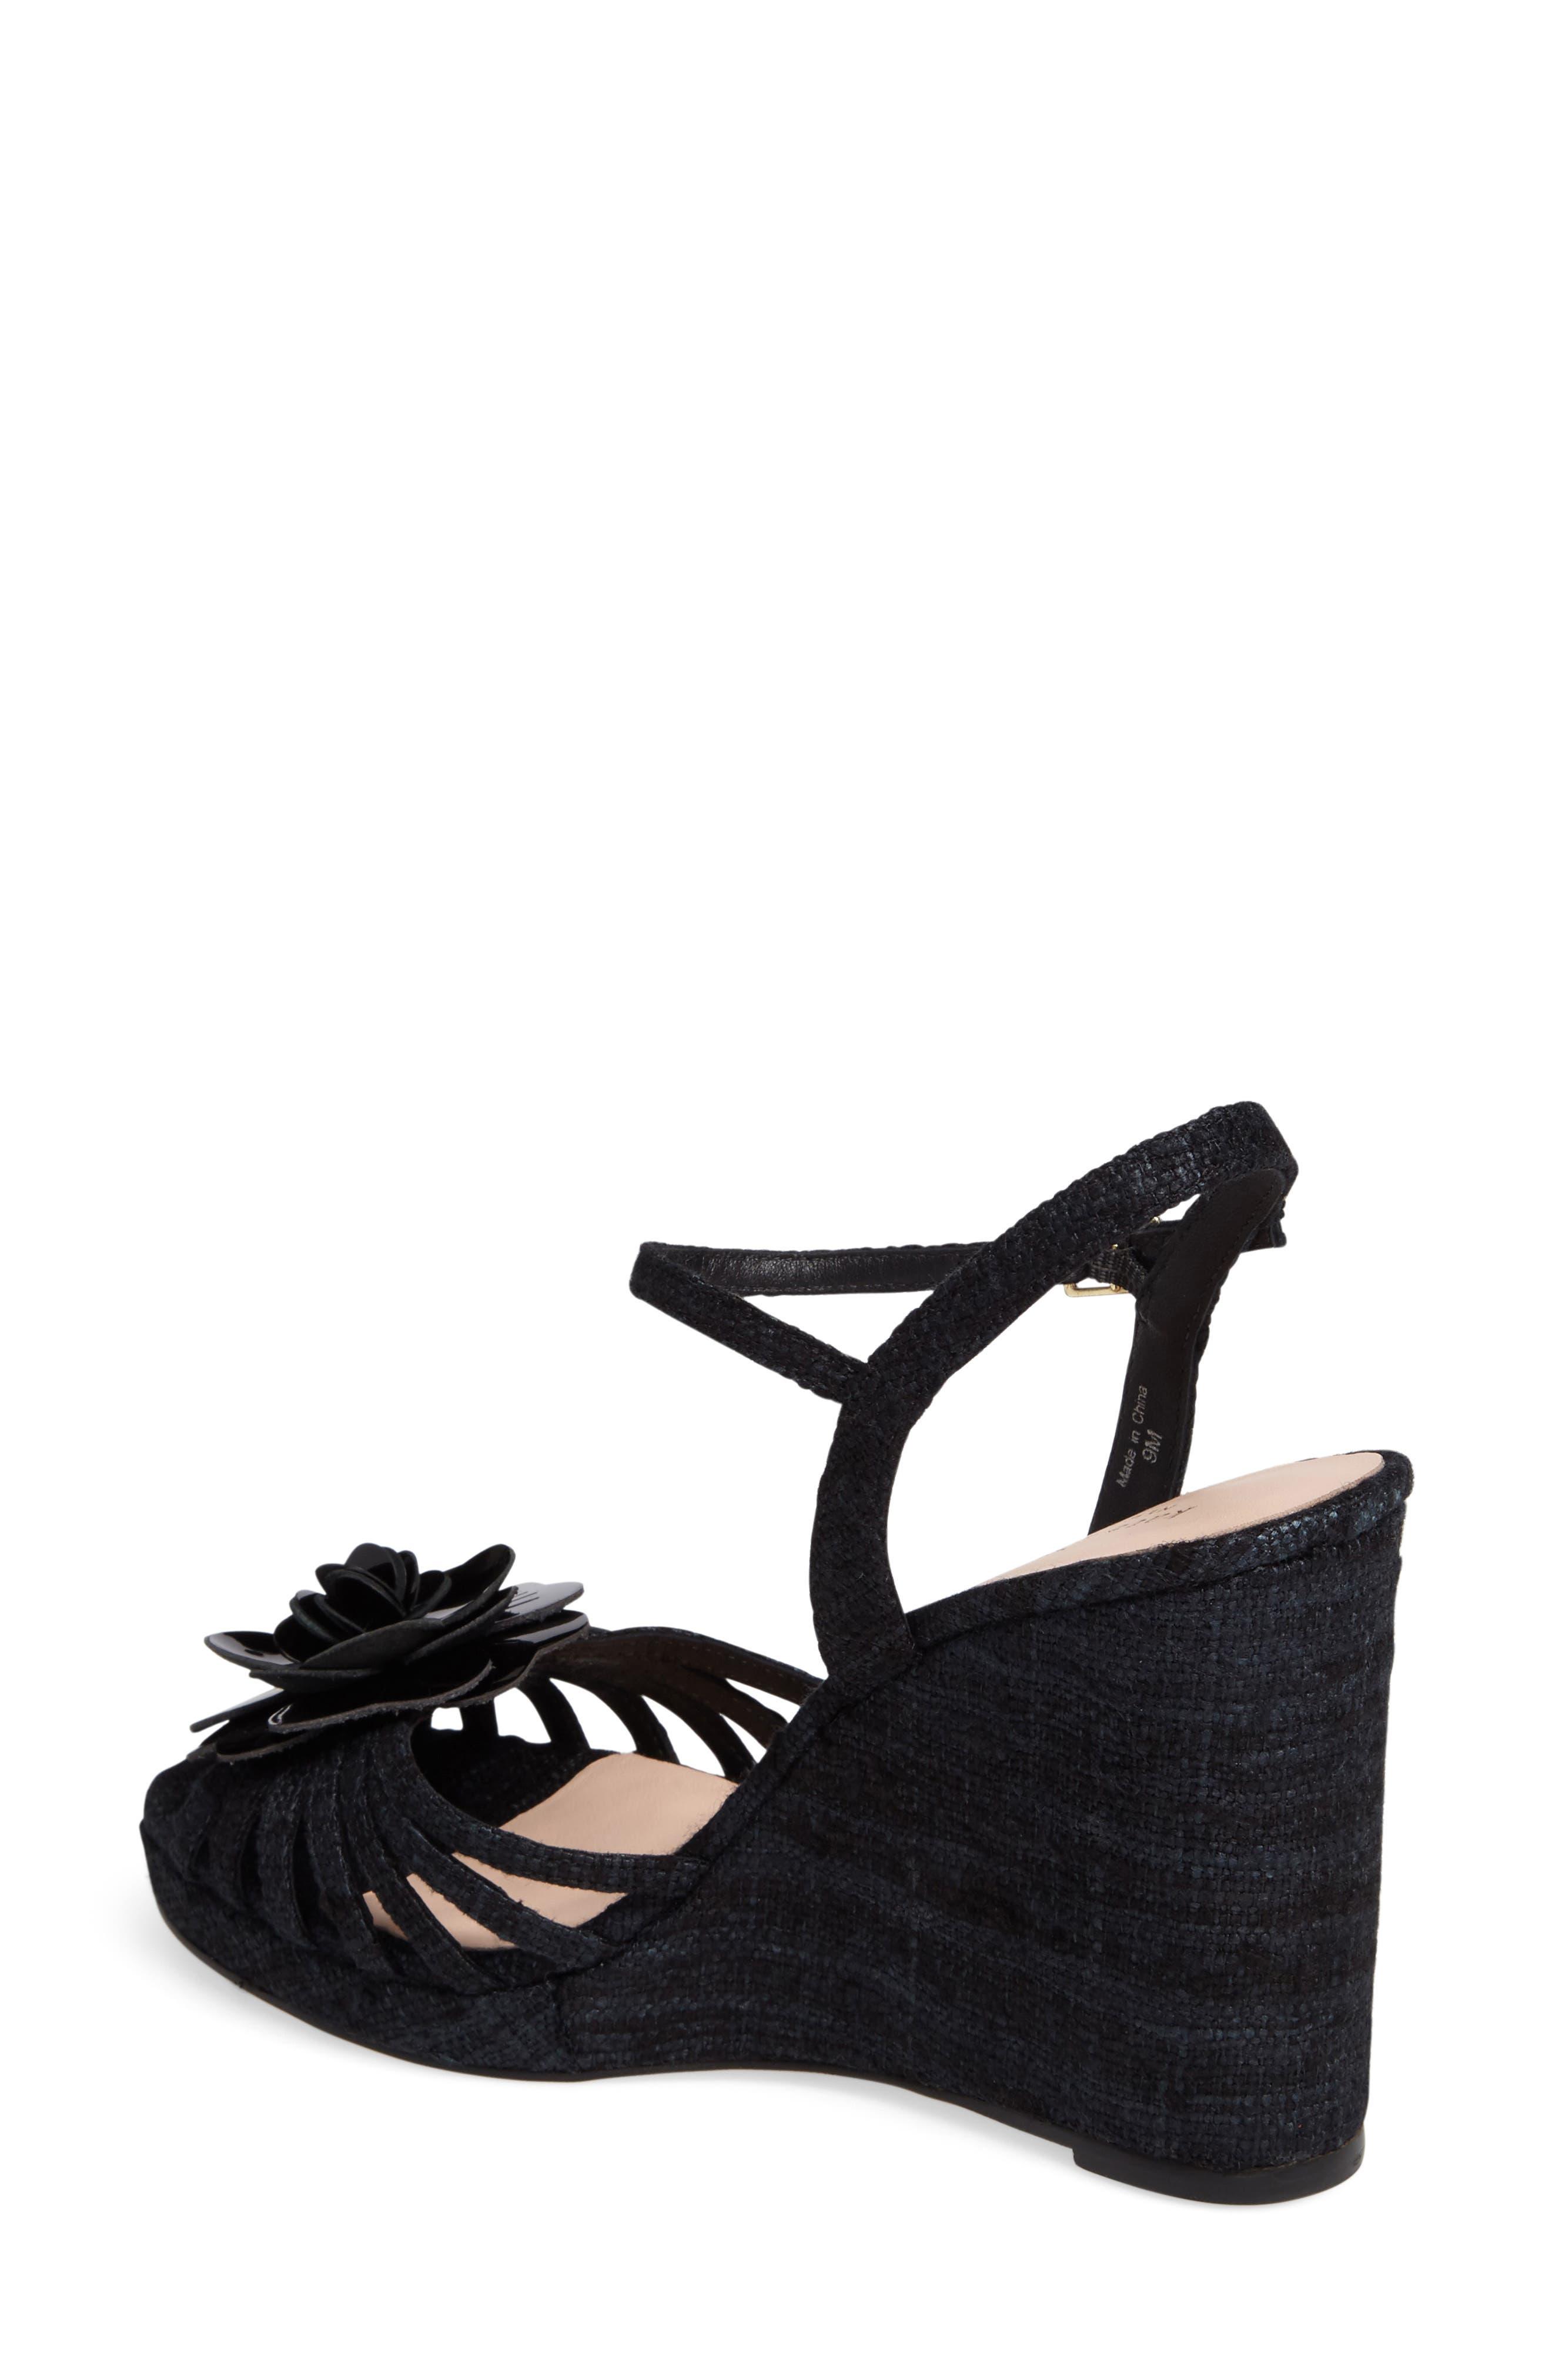 beekman strappy wedge sandal,                             Alternate thumbnail 2, color,                             001